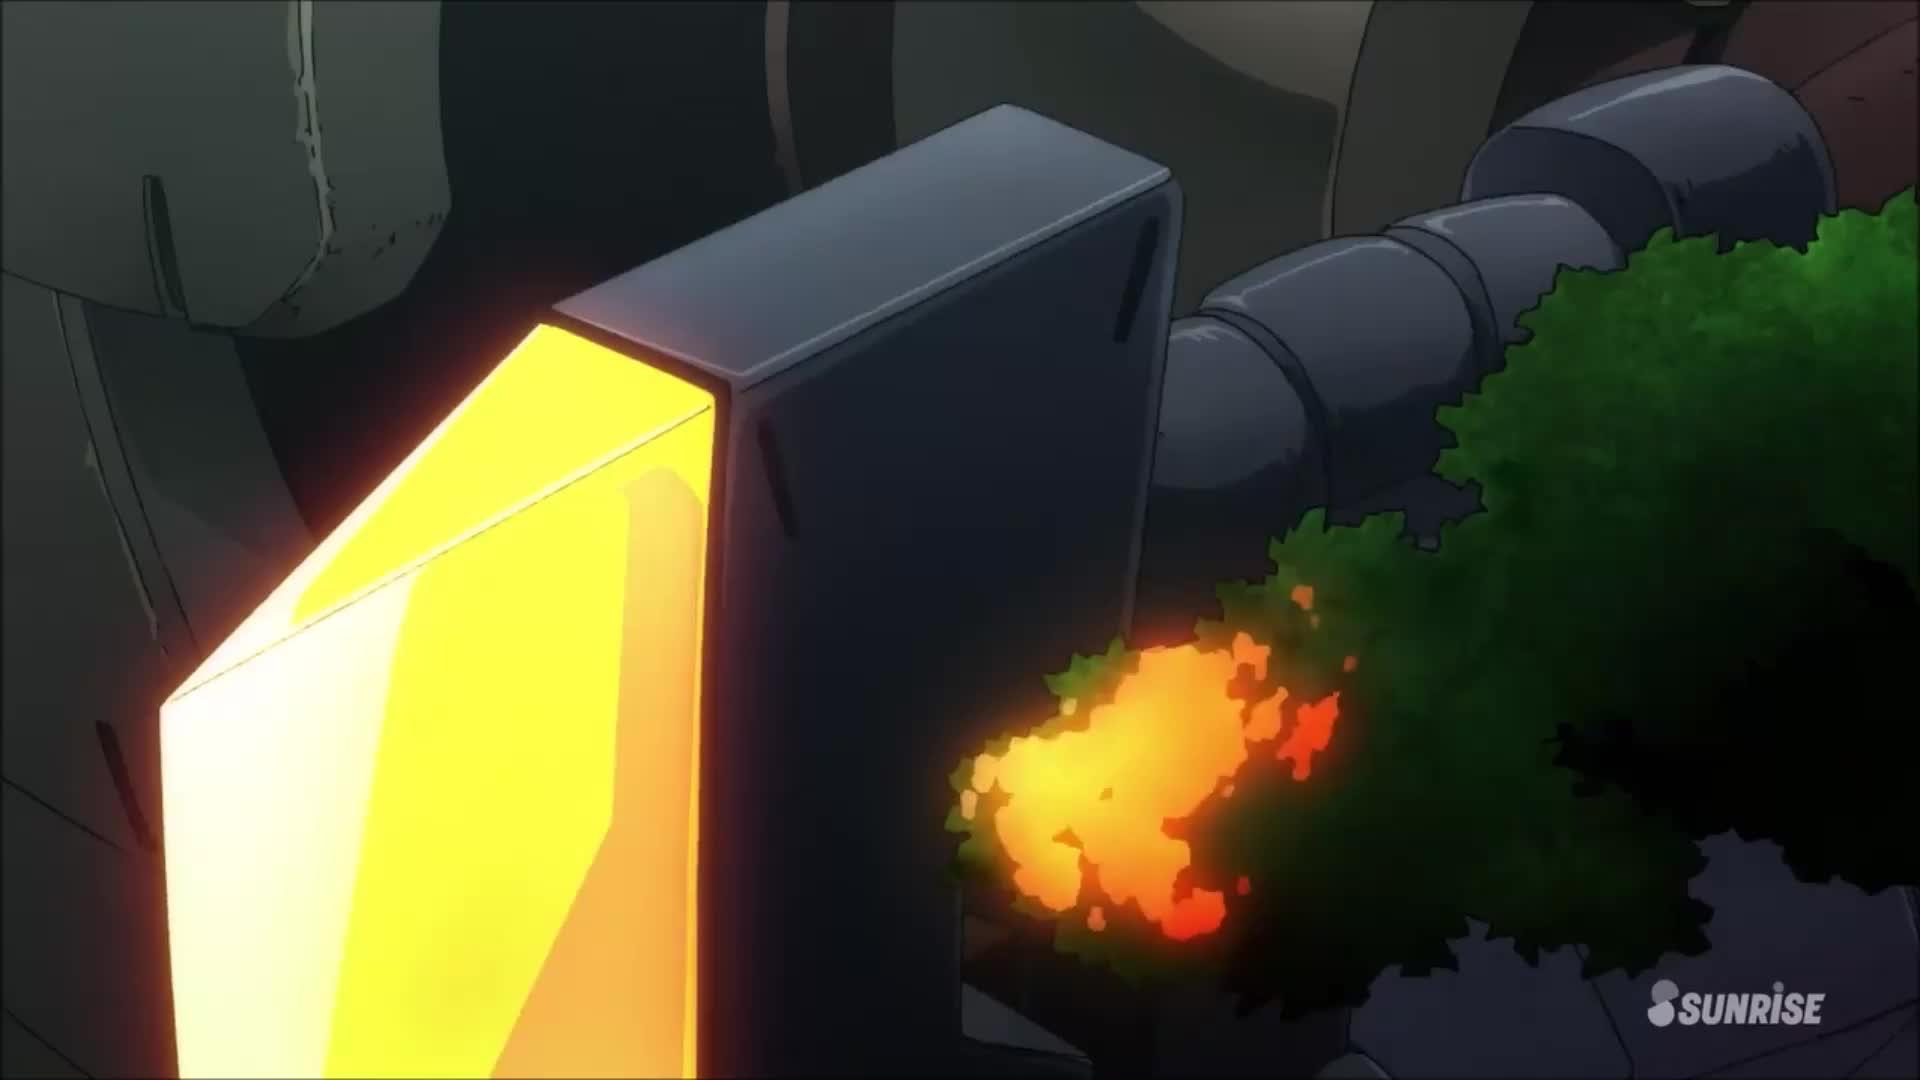 anime, animefunny, gundam, look at these Acguys arent they cute? [Gundam thunderbolt] GIFs